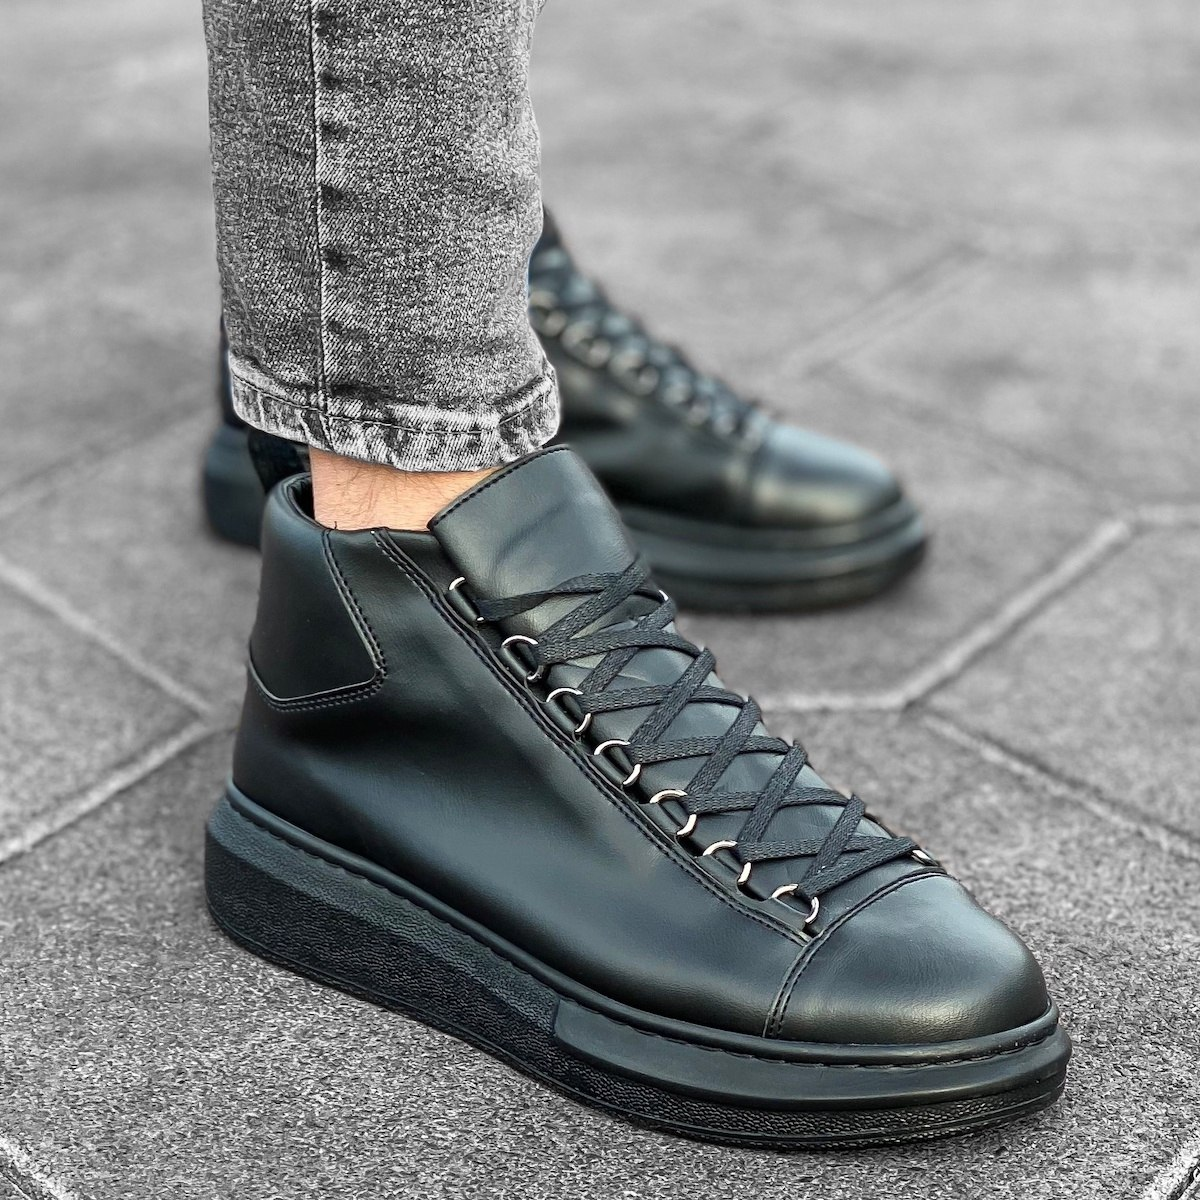 Hype Sole Mox High Top Sneakers In Full Black